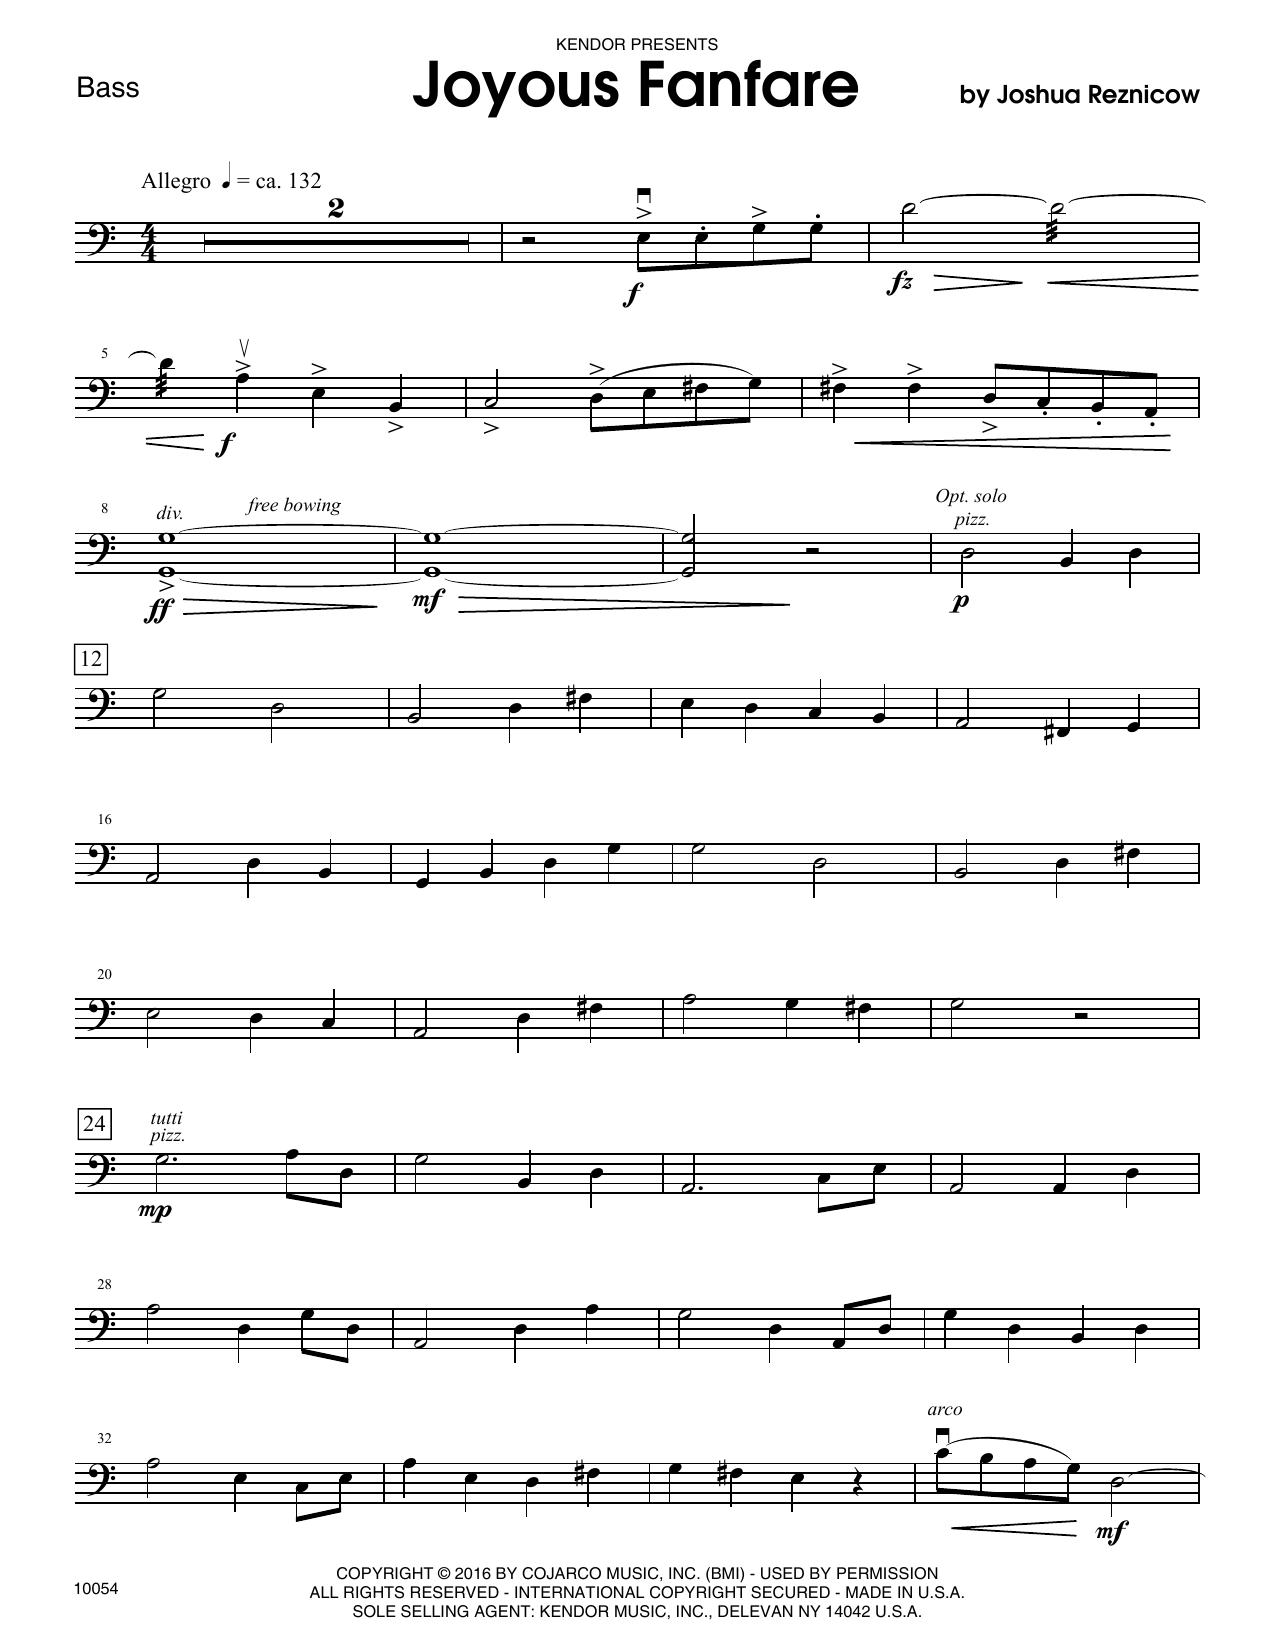 Joyous Fanfare - Bass Sheet Music